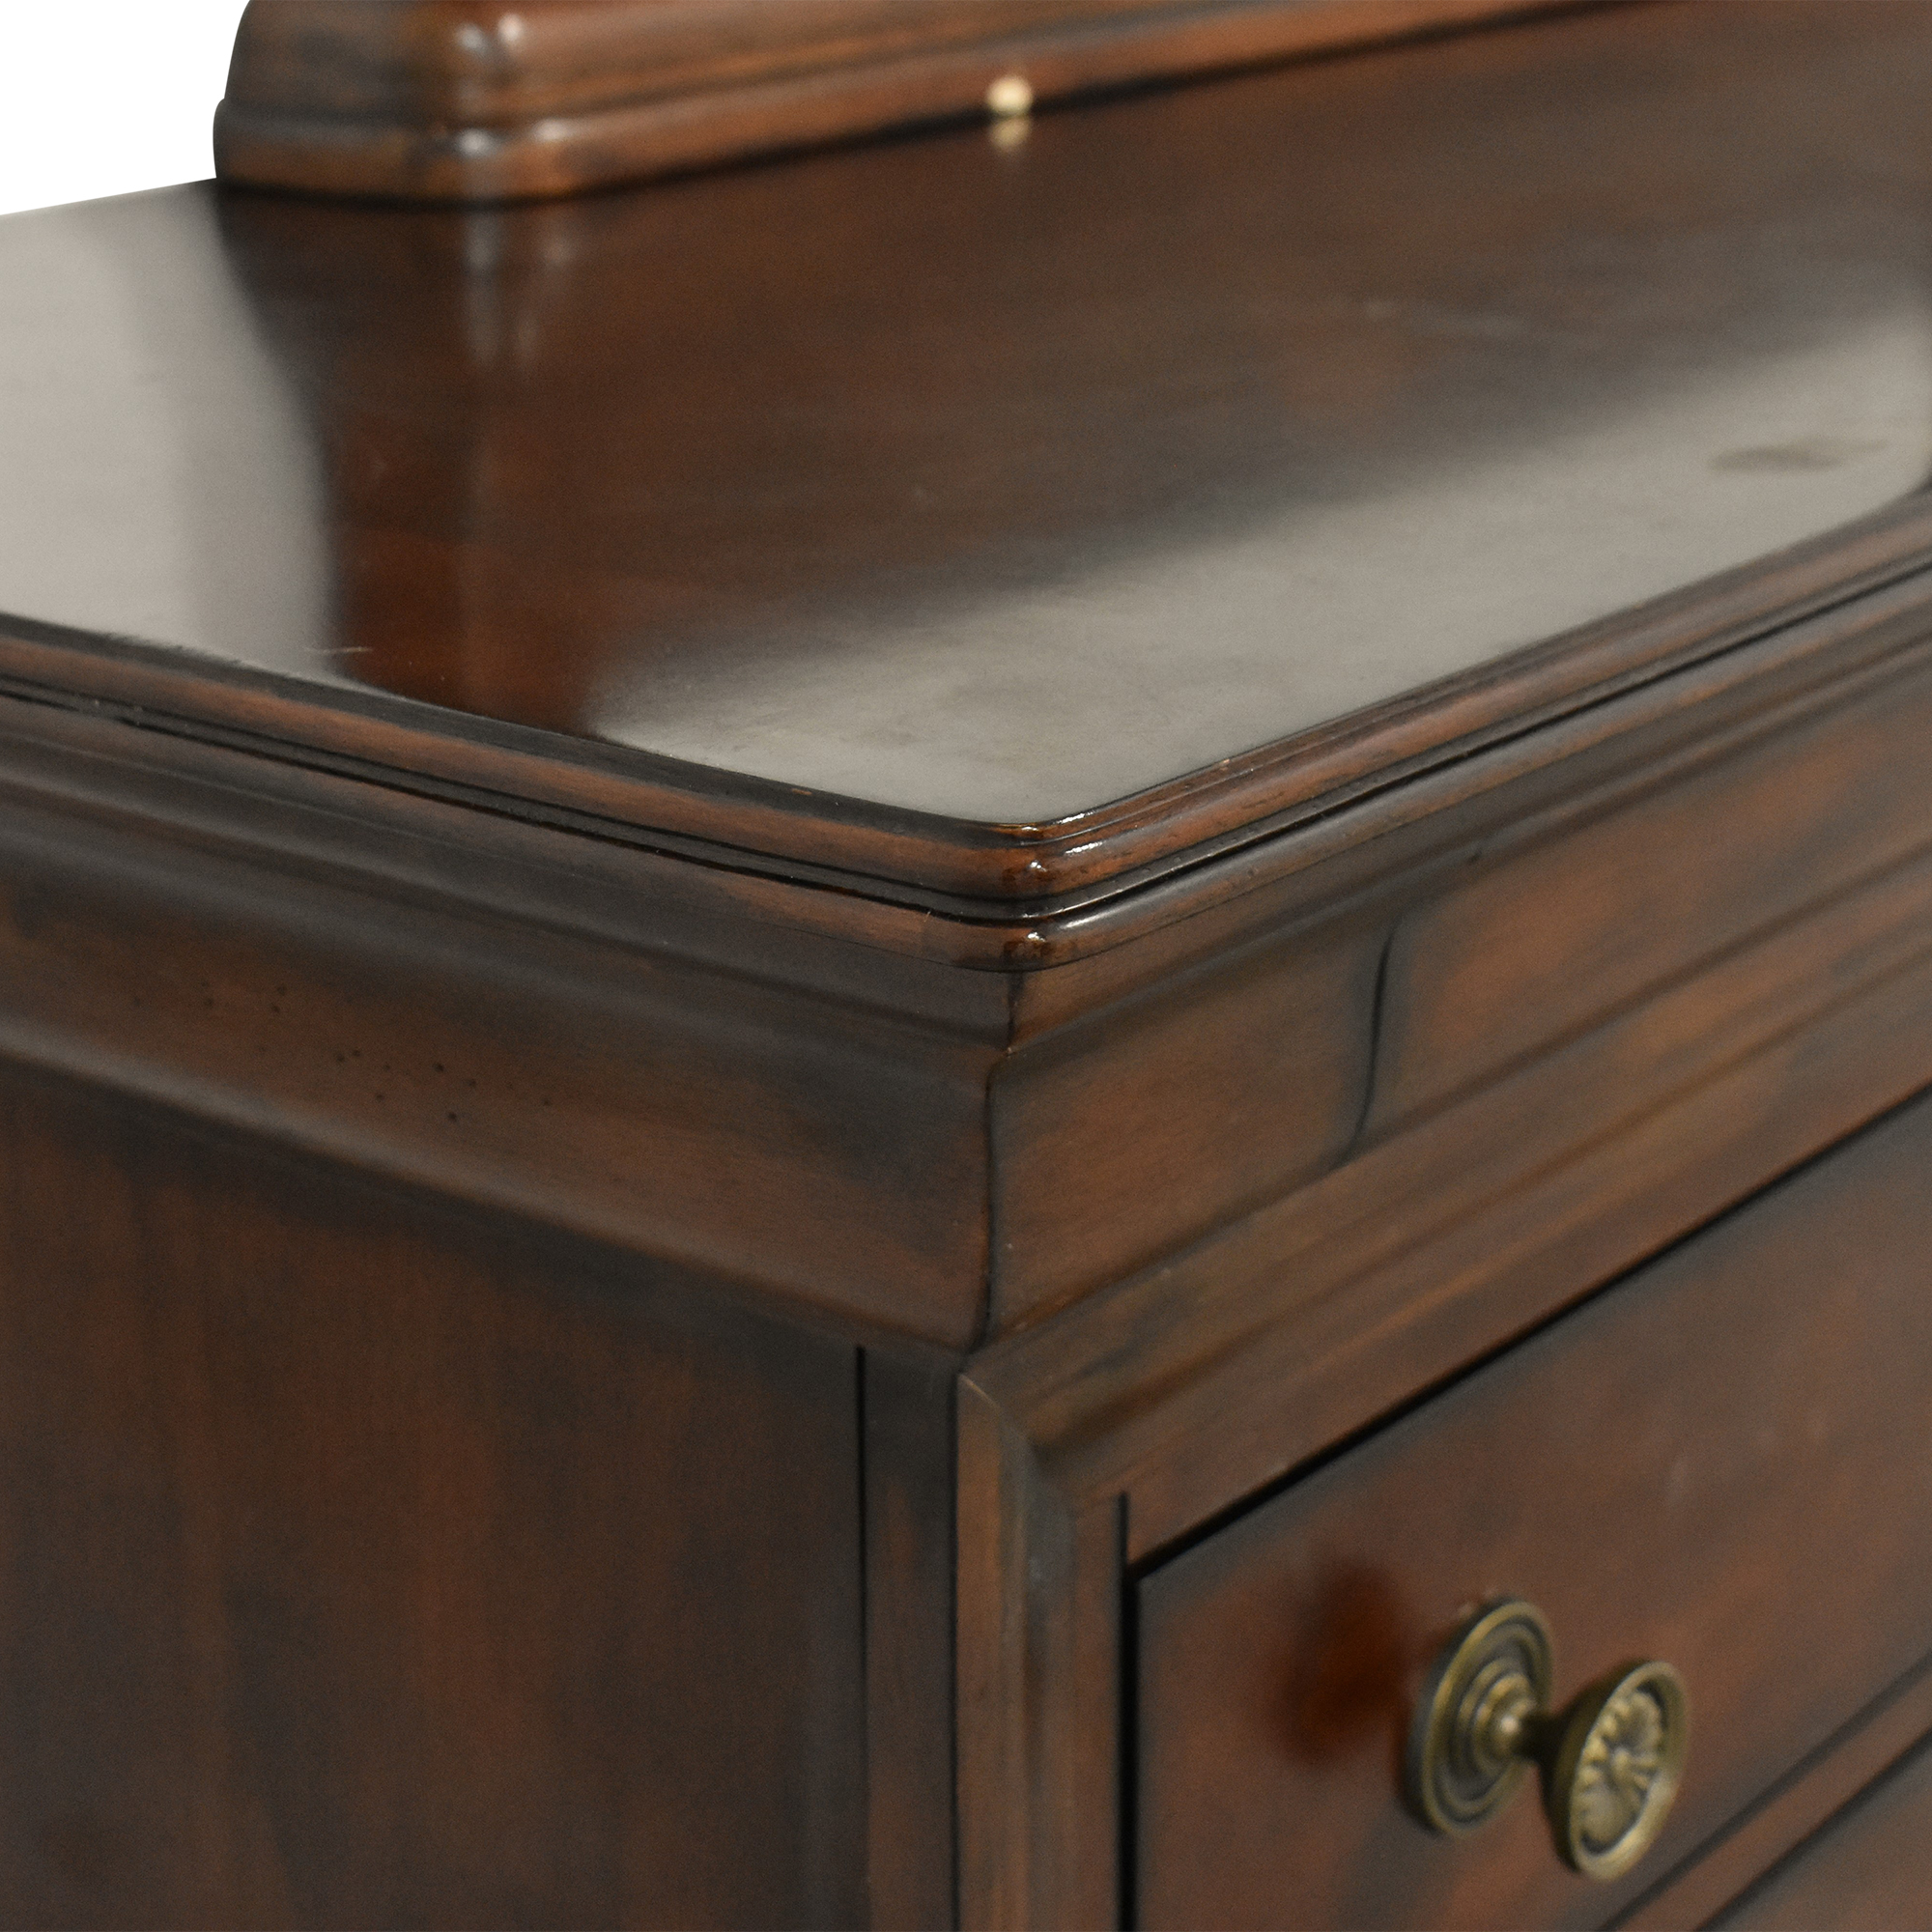 Bassett Furniture Bassett Eight Drawer Dresser with Mirror second hand